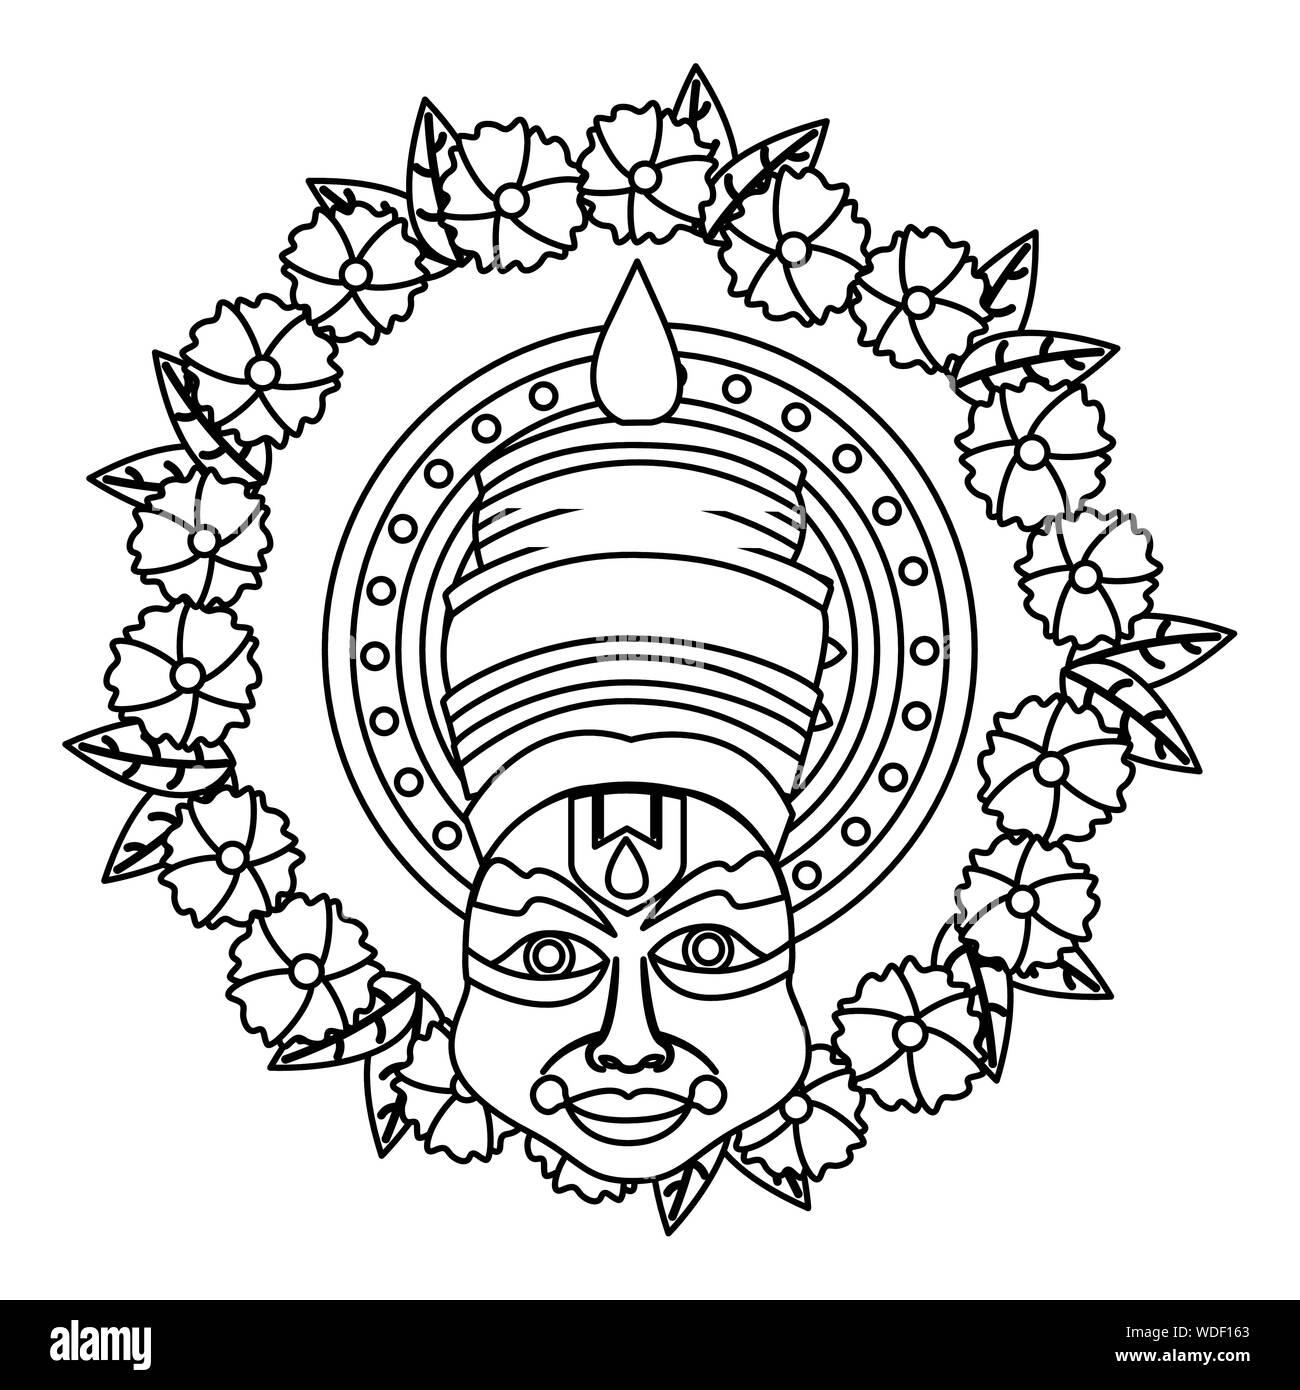 Kathakali Of Onam Celebration Design Stock Vector Image Art Alamy